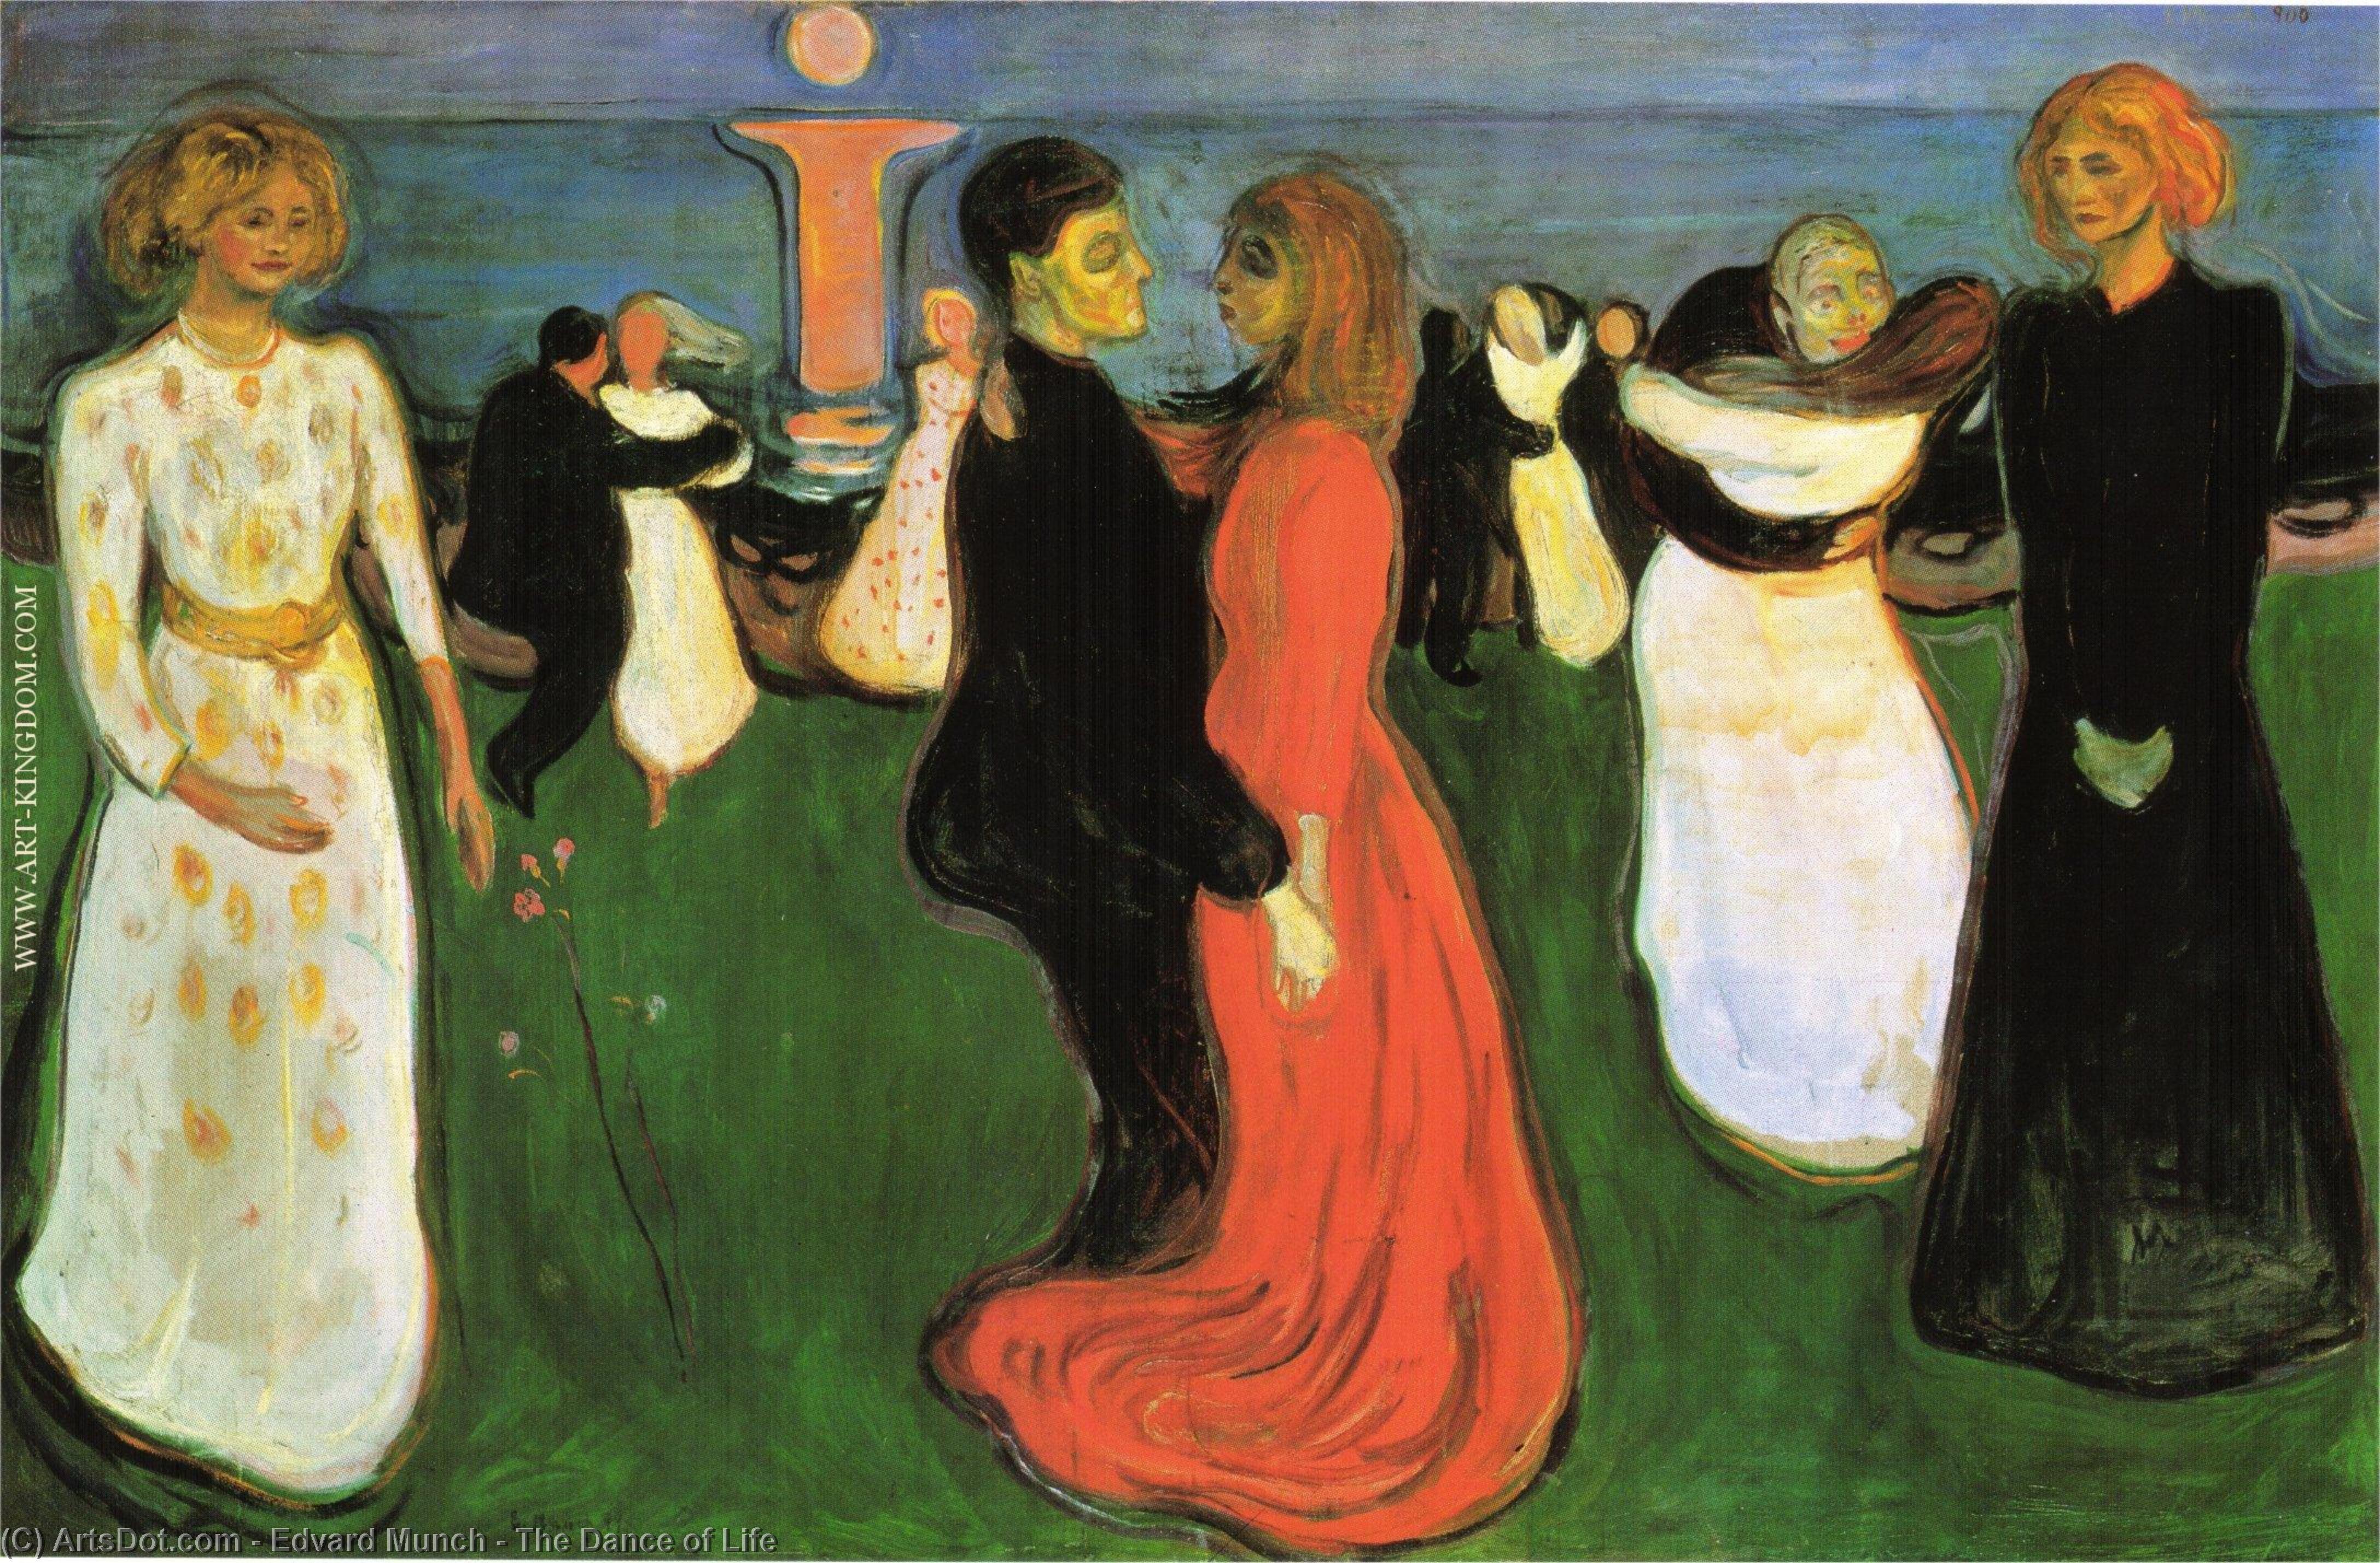 WikiOO.org - Encyclopedia of Fine Arts - Schilderen, Artwork Edvard Munch - The Dance of Life